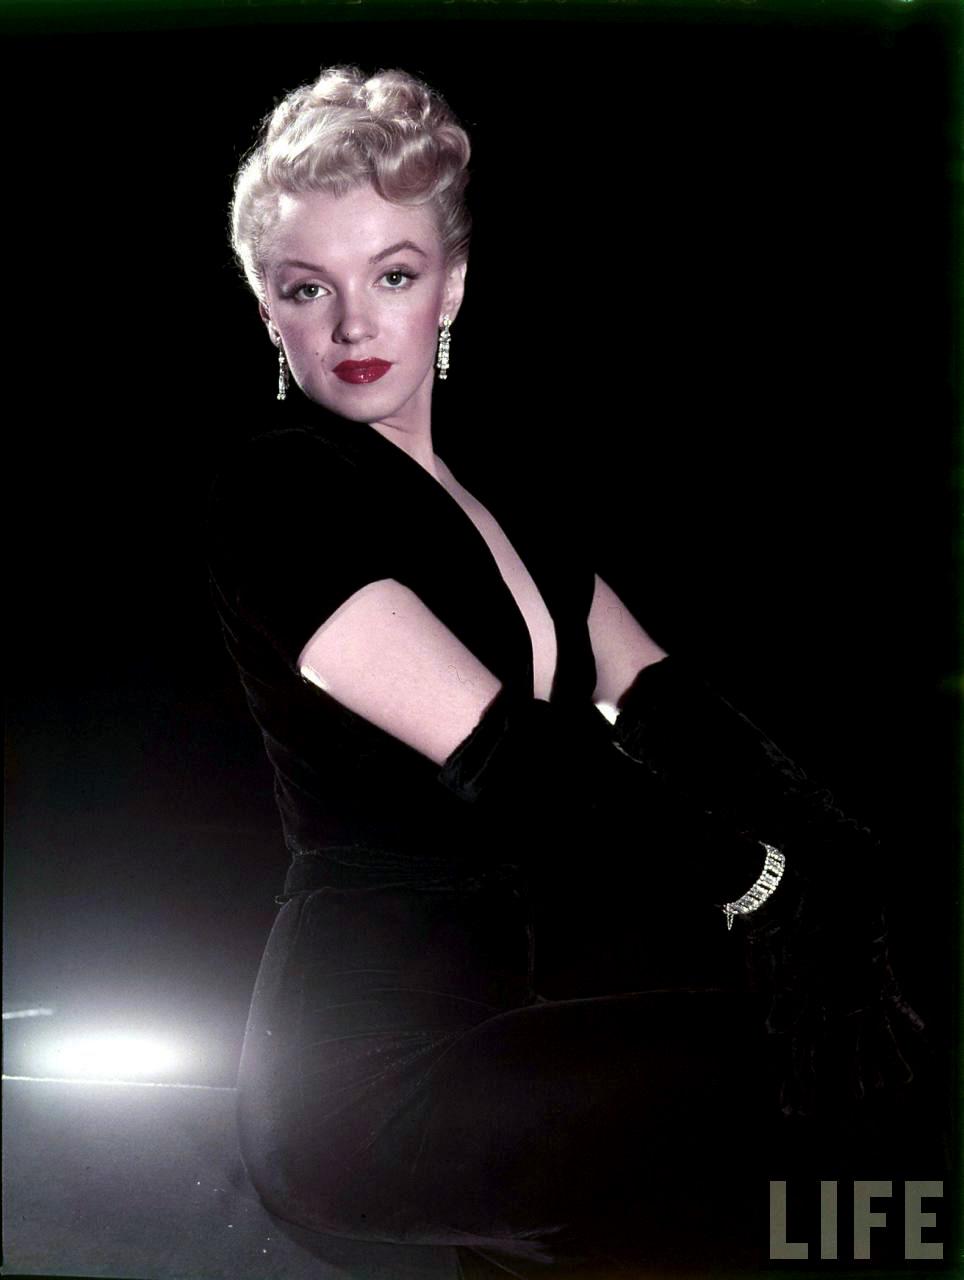 1925 Rolls Royce Phantom >> Portraits of Marilyn Monroe by Edward Clarke, 1950 ~ vintage everyday